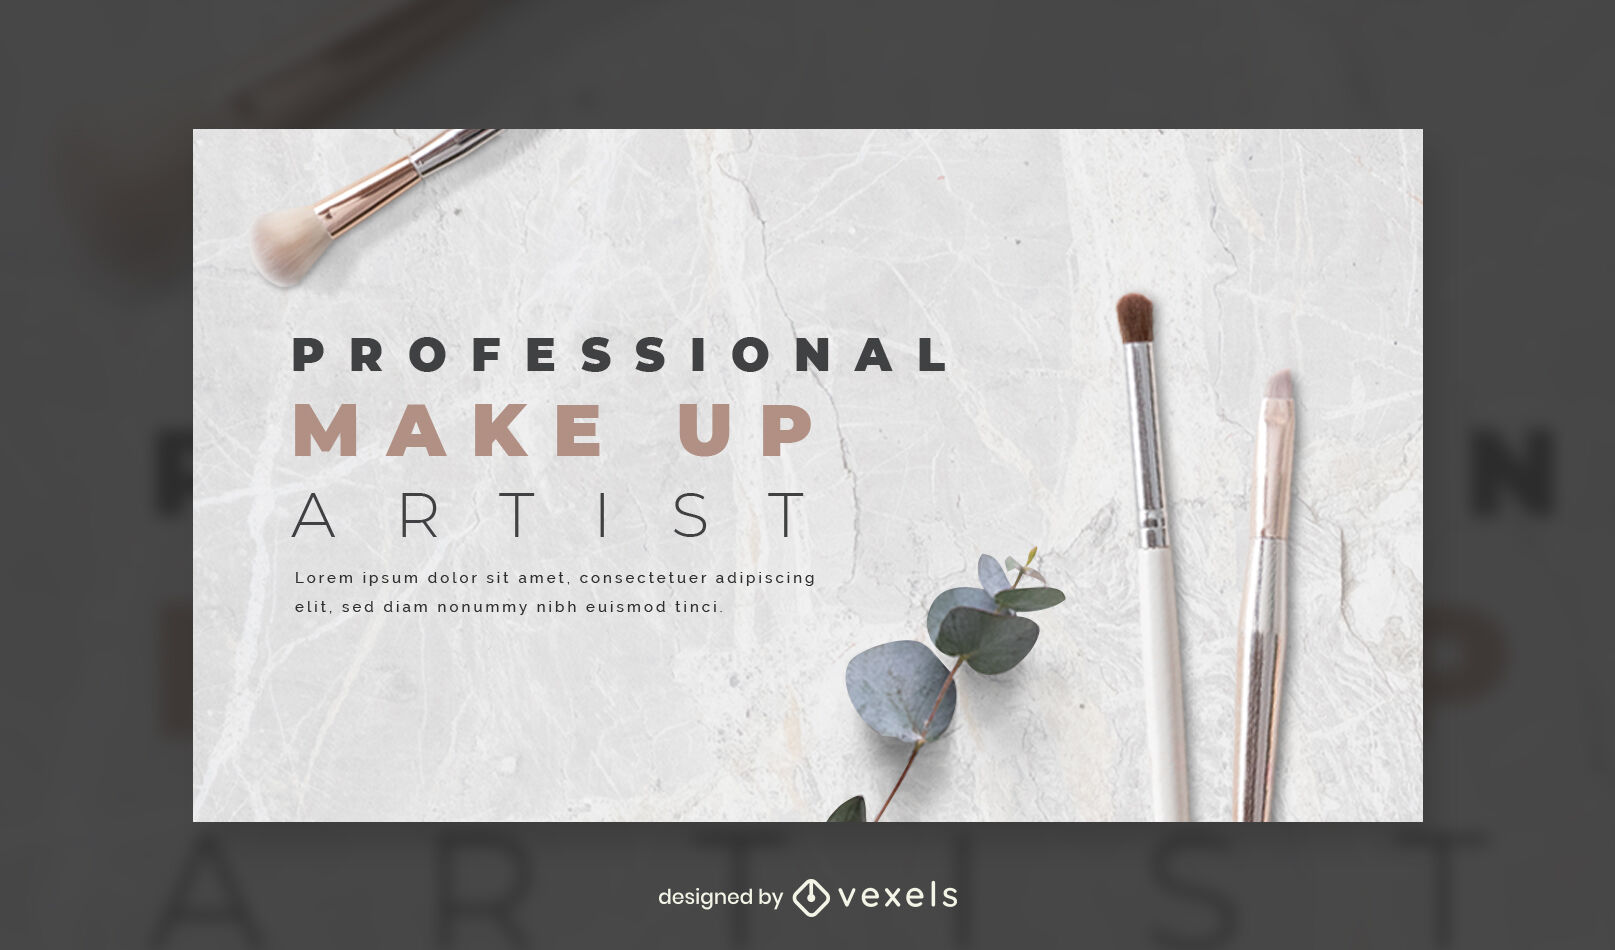 Plantilla de portada de facebook fotográfica de artista de maquillaje